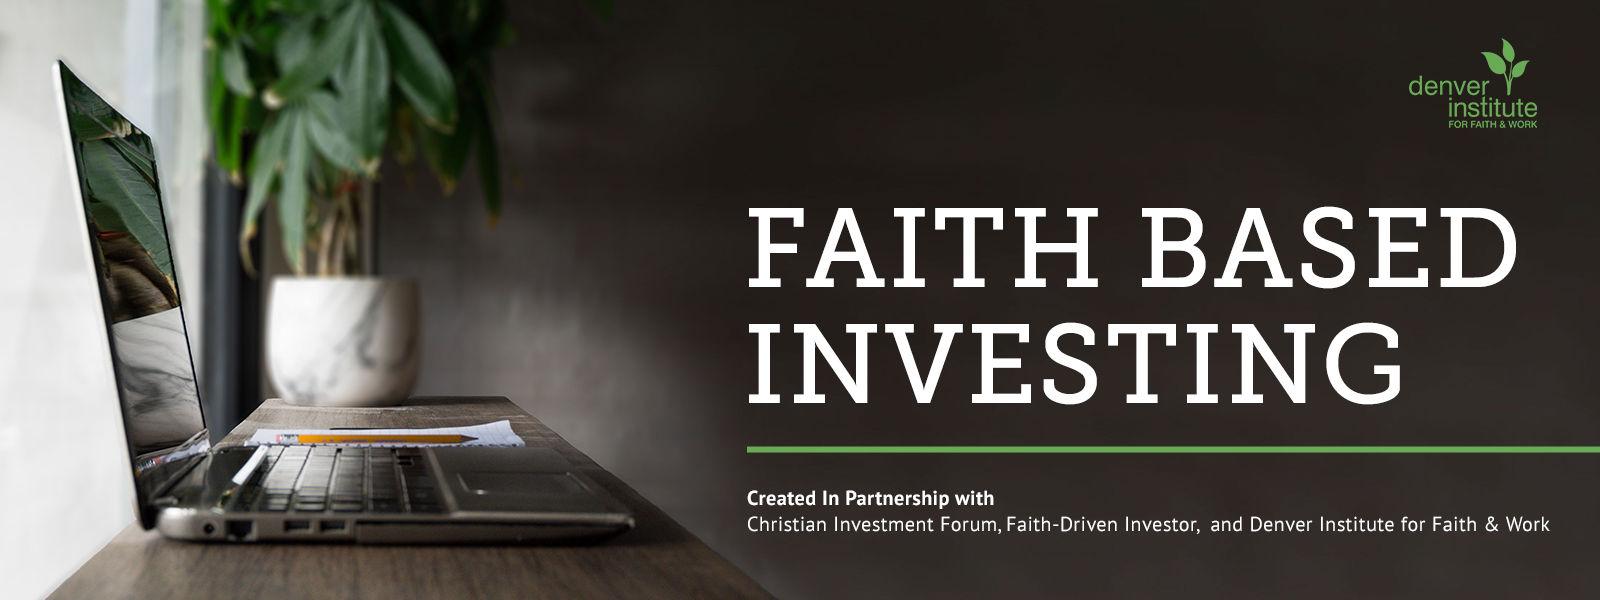 Faith Based Investing